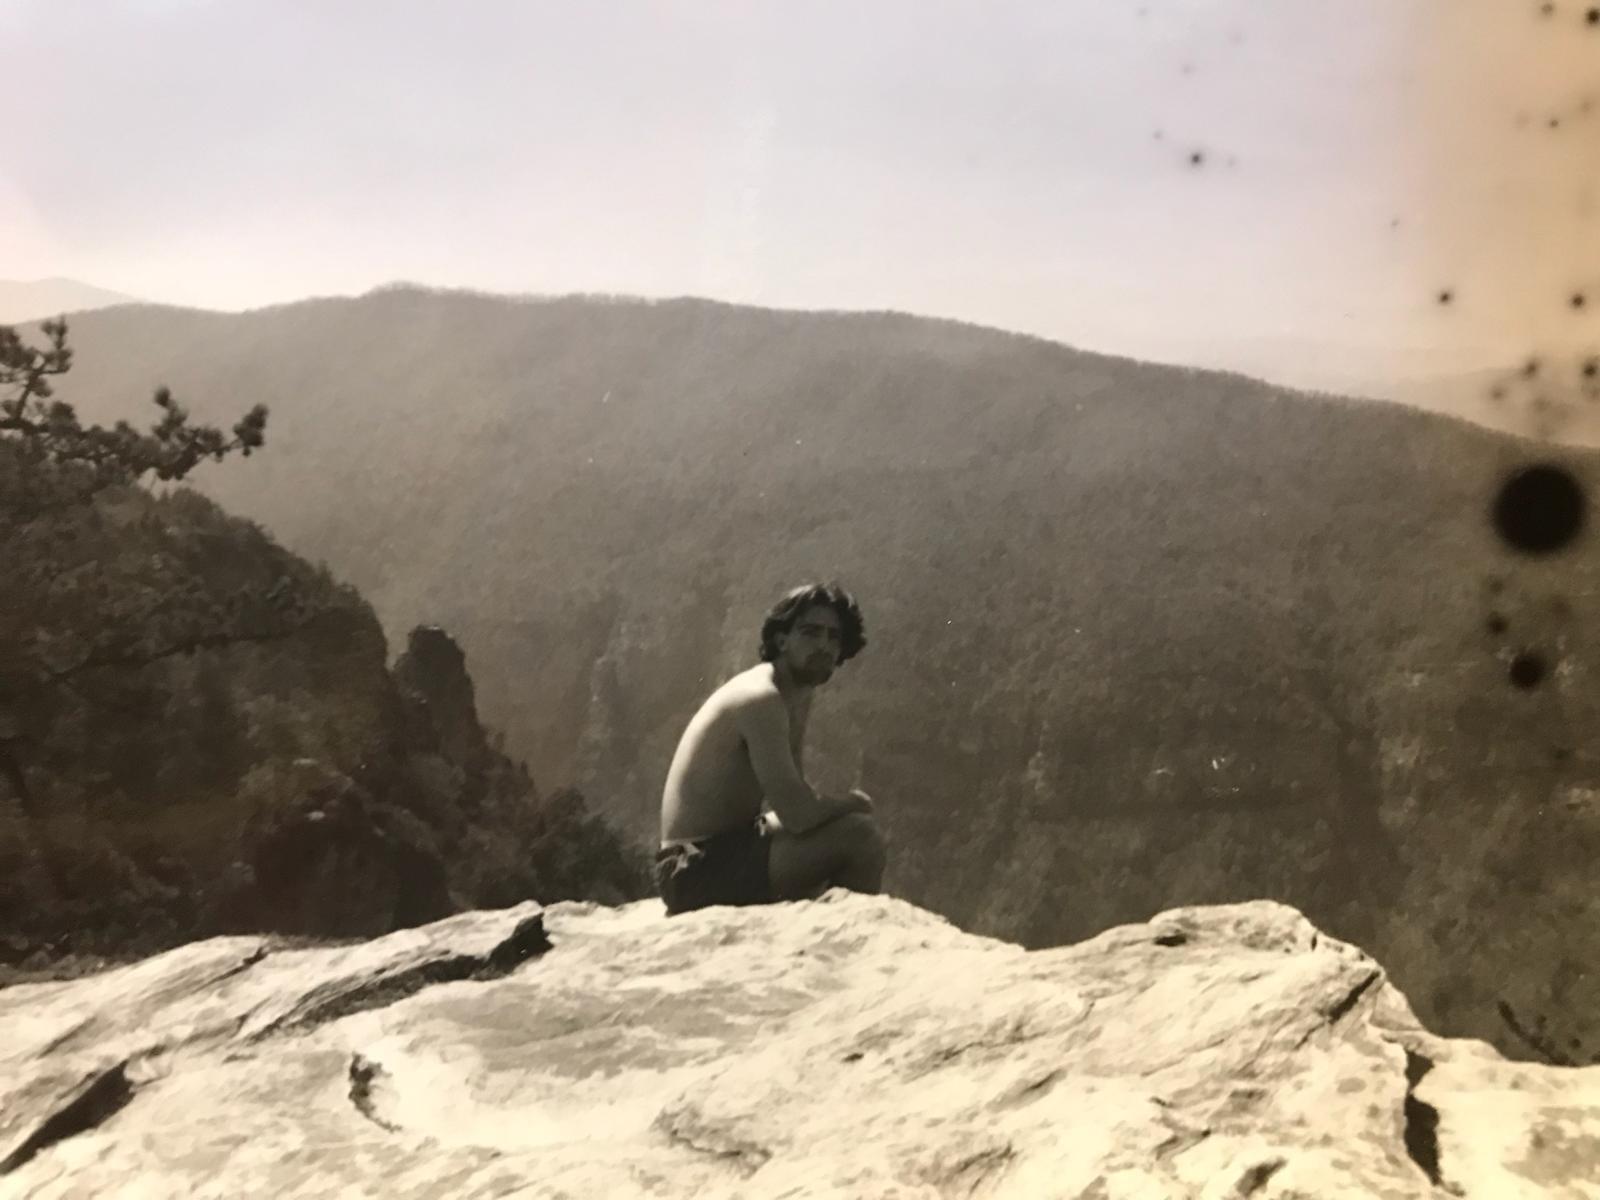 Ryan C. Hurst Shirtless perched on a mountain edge